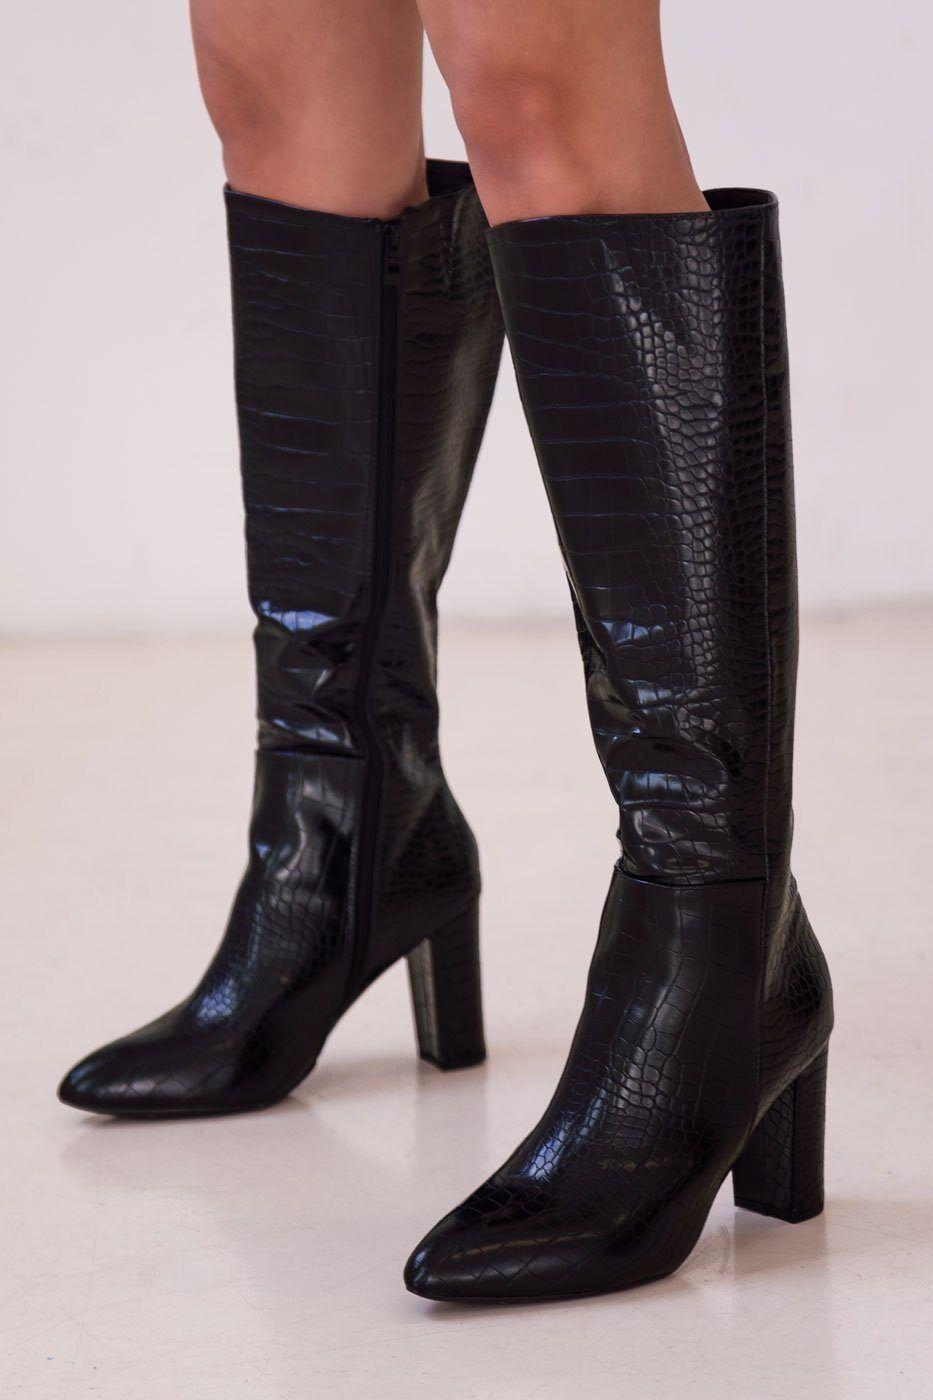 TOP MODA Talk Me Up Black Vegan Croc Boots  - J1006 BLACK 5.5